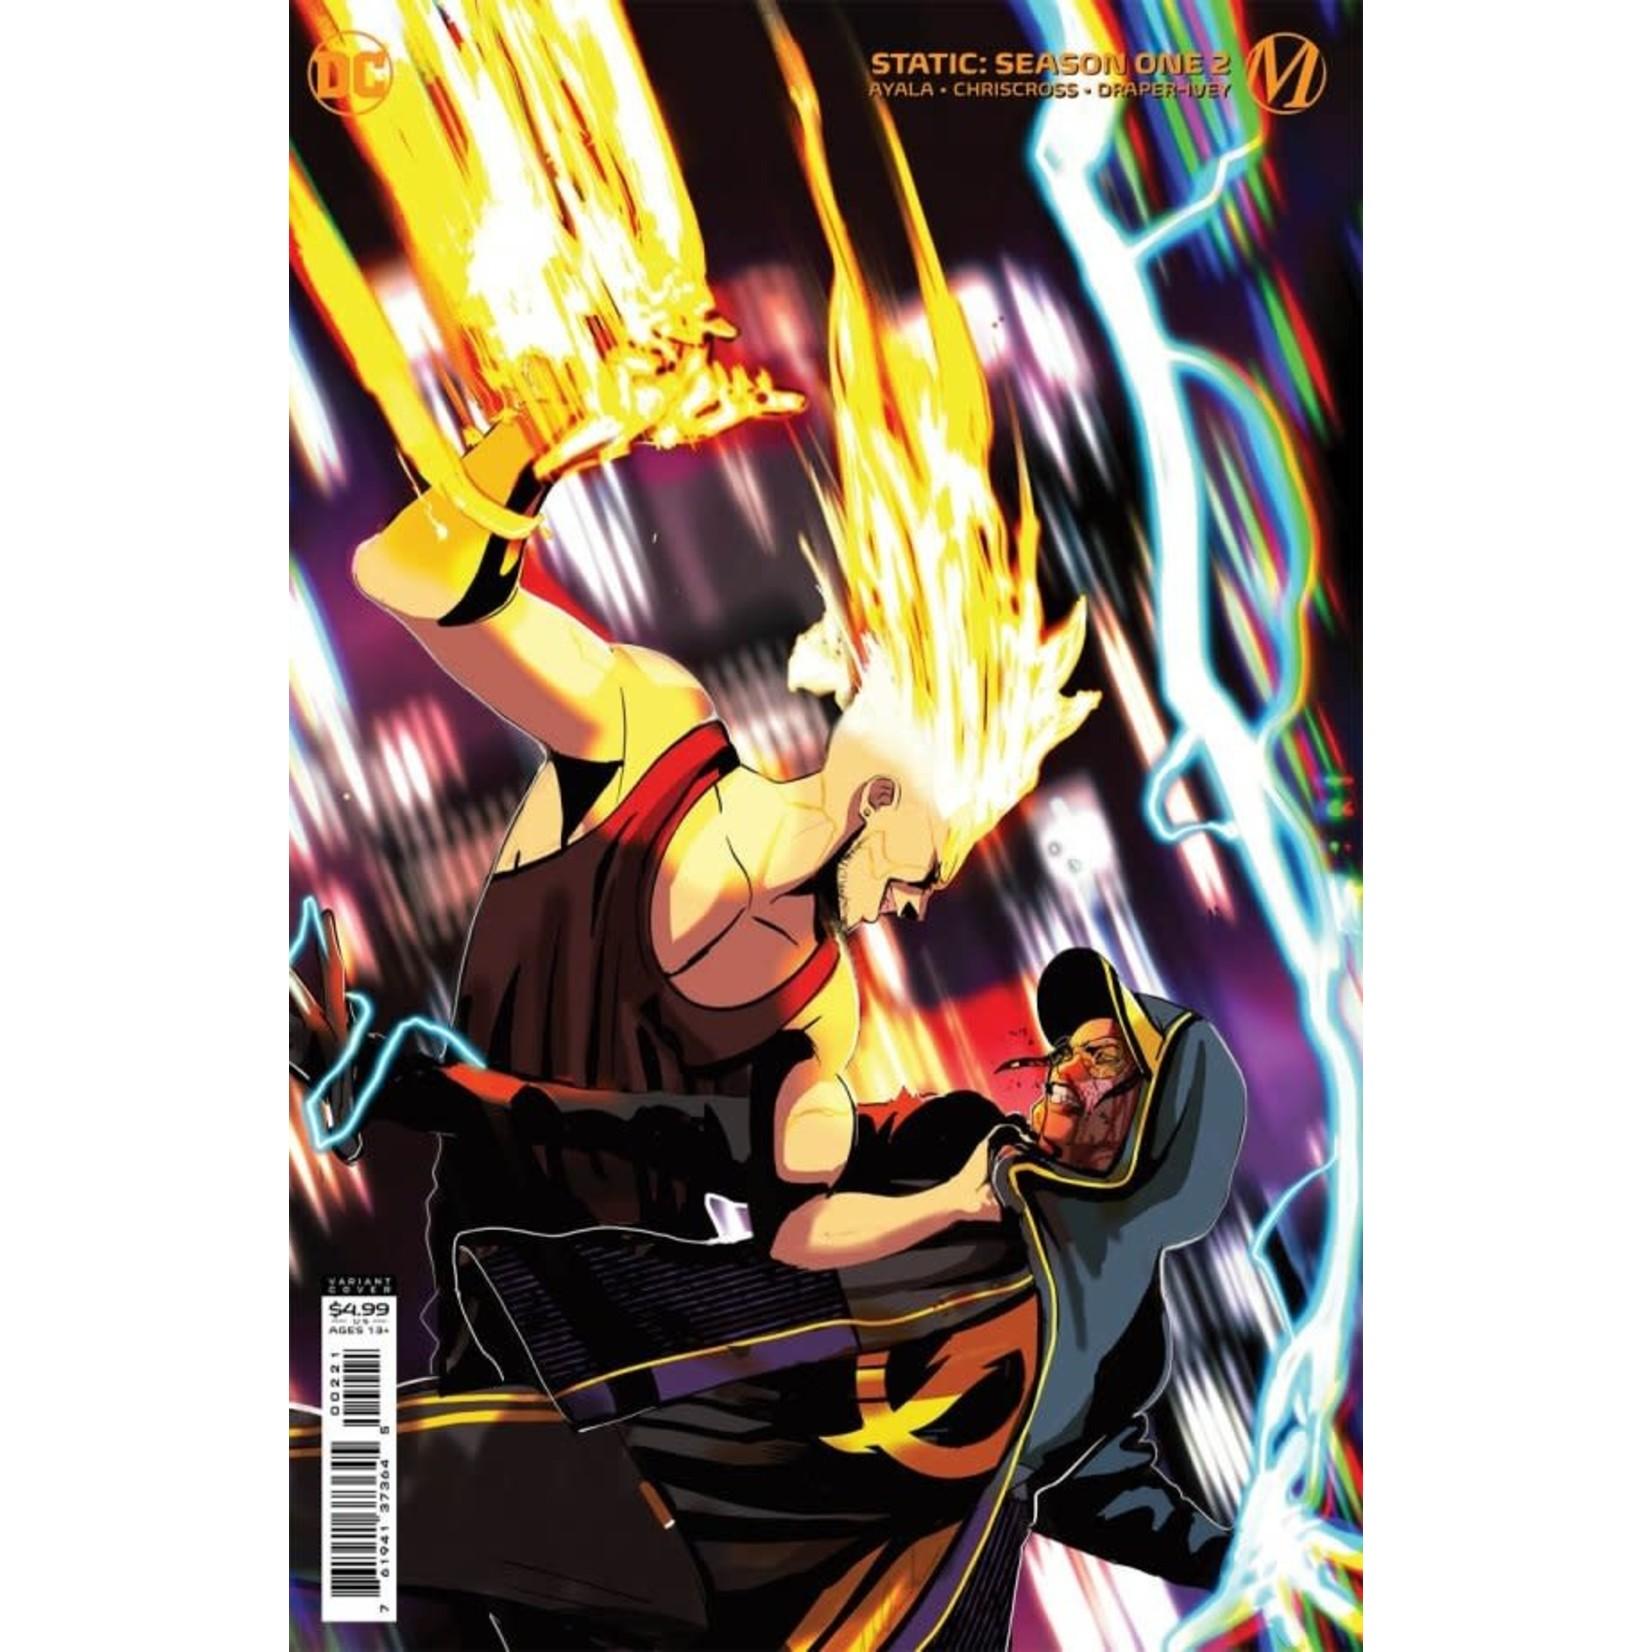 DC Comics Static: Season One #2 Card Stock Variant Cover